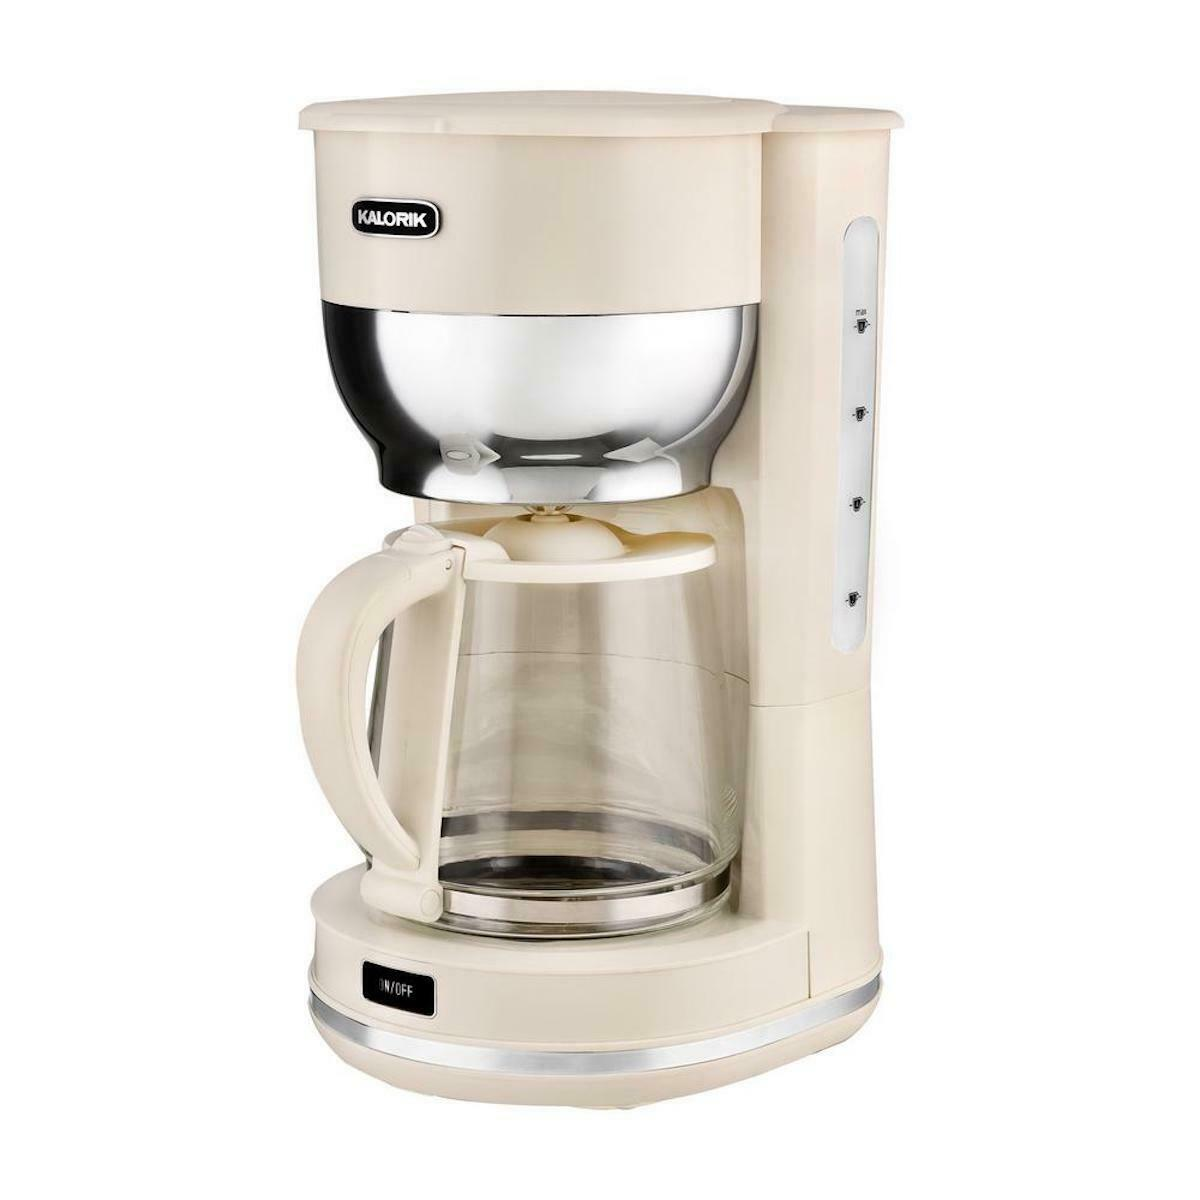 KALORIK 10 CUP RETRO COFFEE MAKER CERTIFIED REFURBISHED